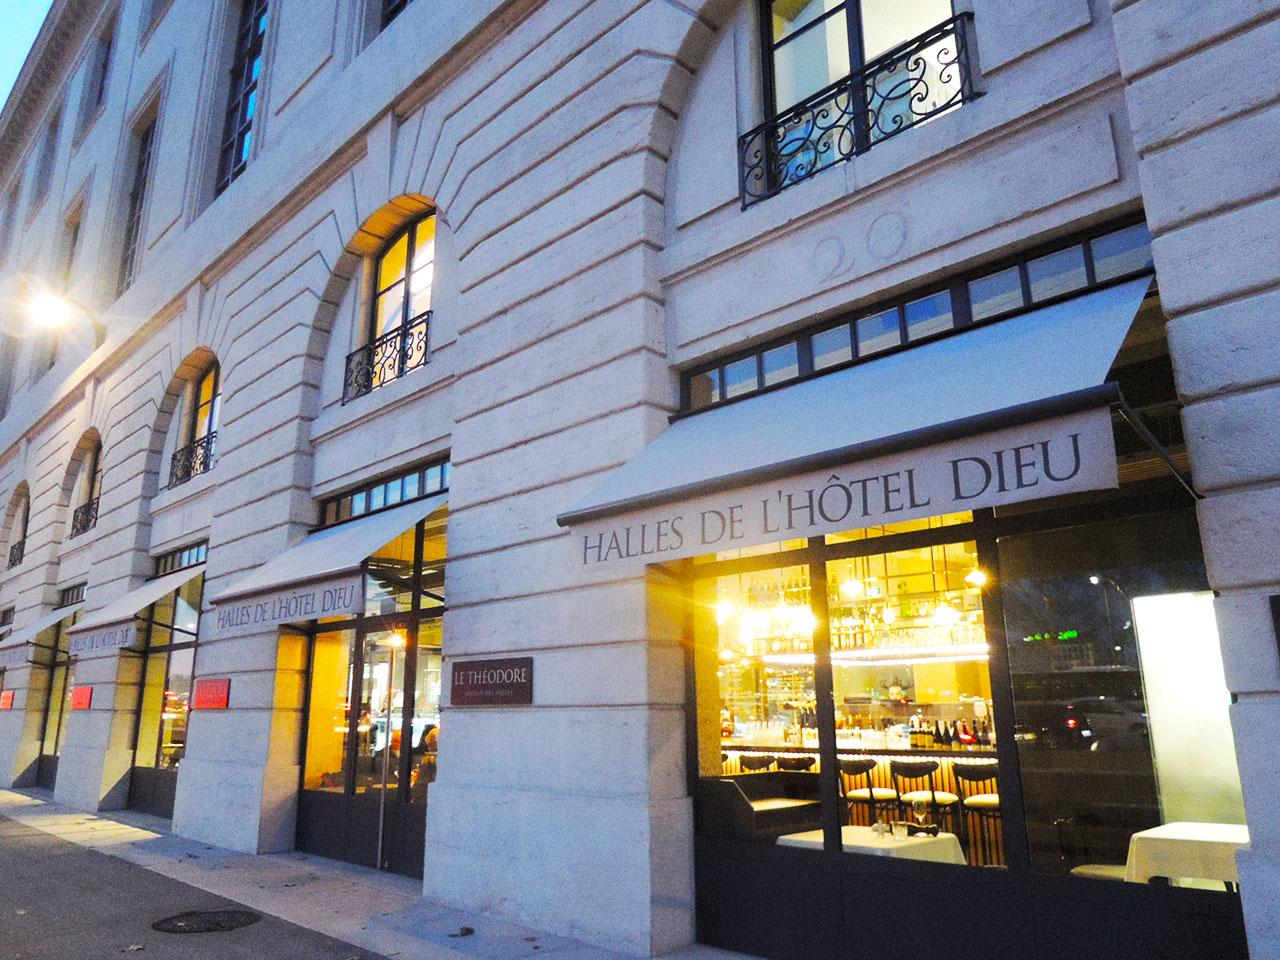 Les Halles Grand Hôtel-Dieu(レアル・グラン・オテルデュー)